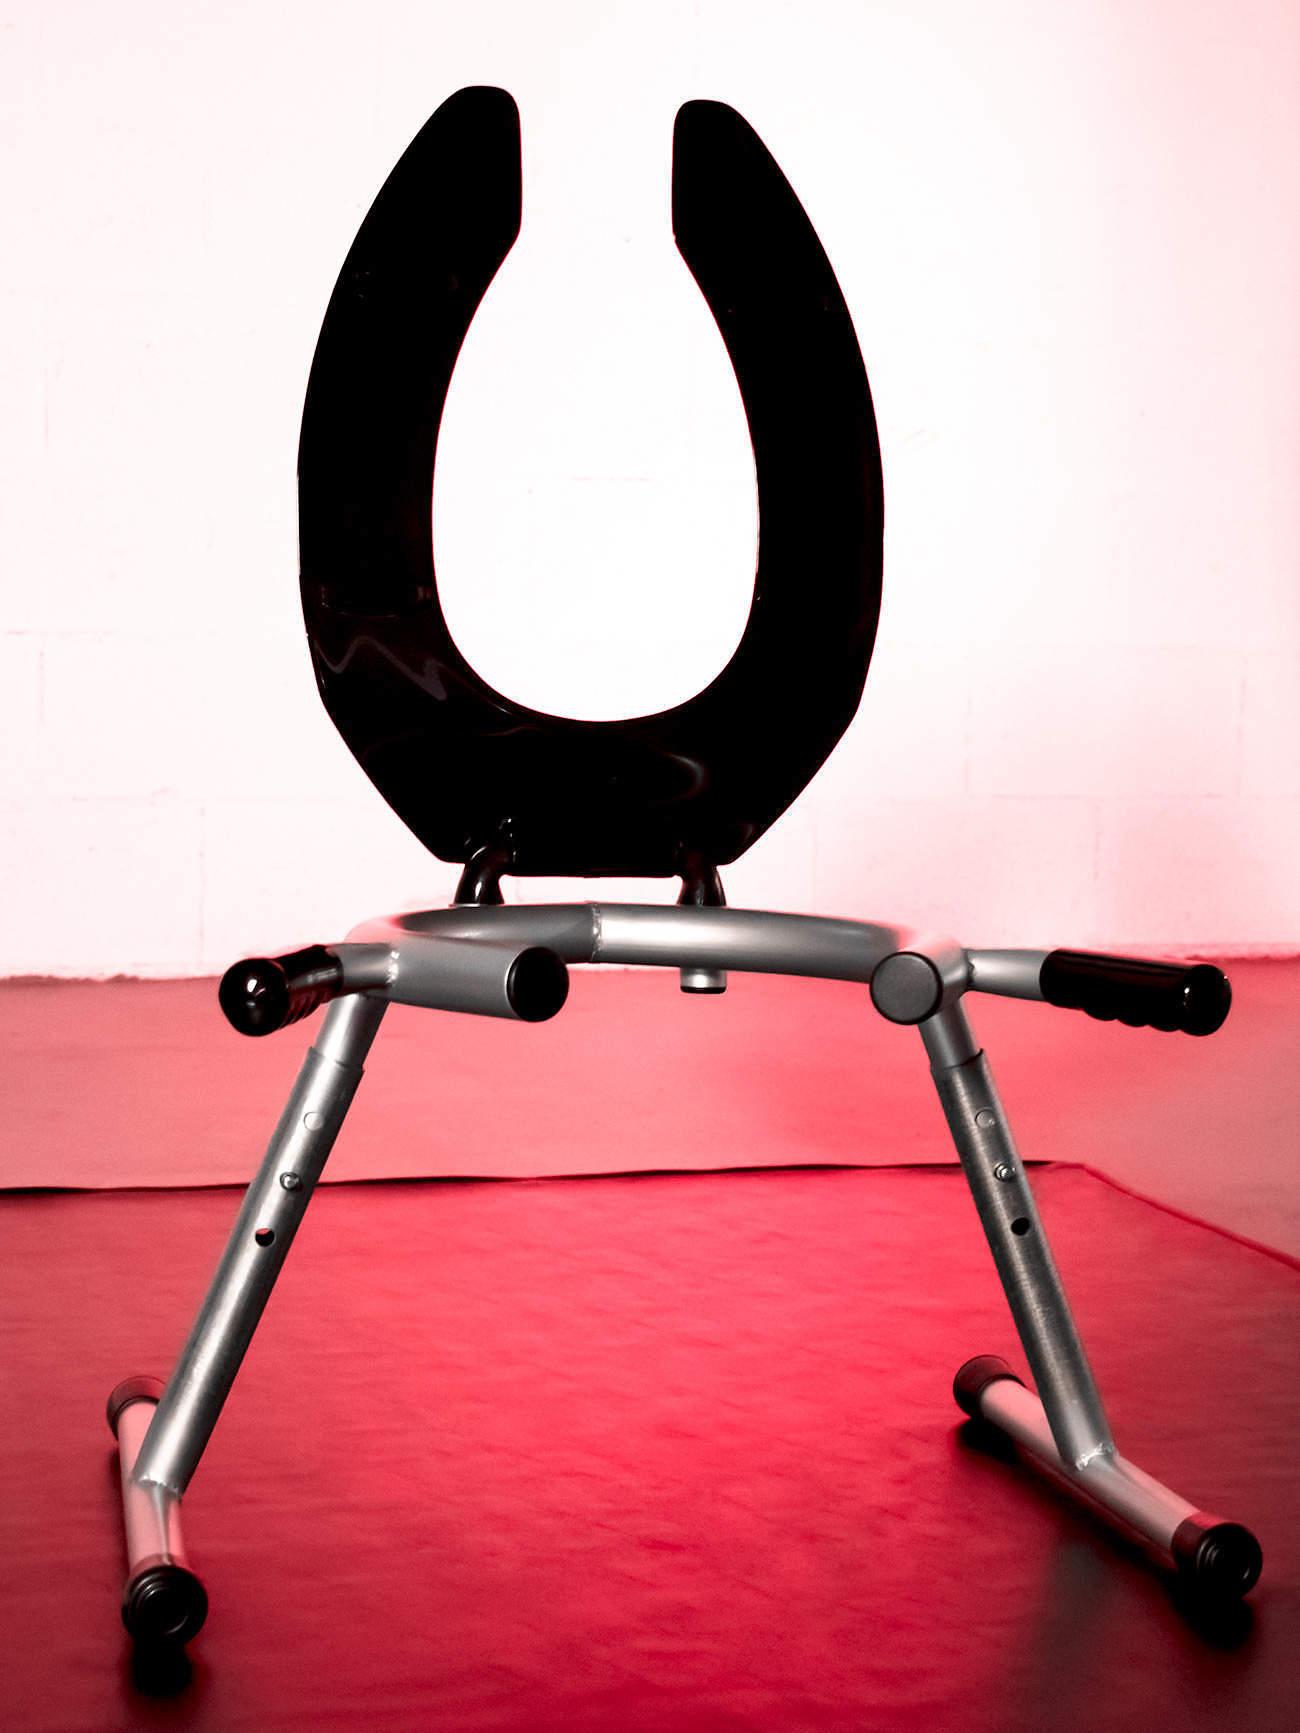 JimSupport Handled T-Leg Rim Seat, Seat Up